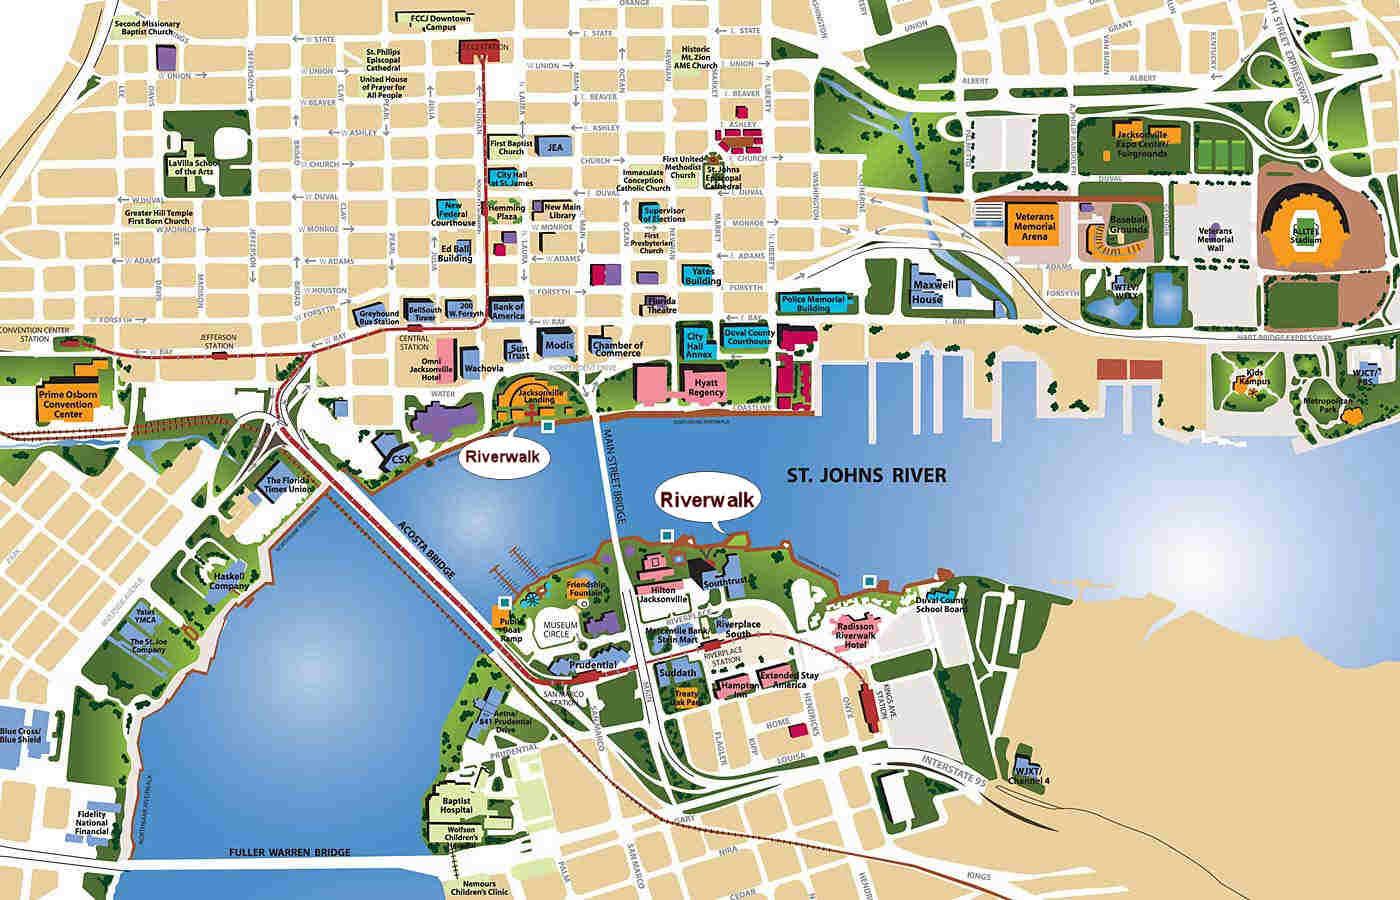 Printable Map Of Jacksonville Fl Area Zip Codes Neighborhoods Florida - Map Of Hotels In Jacksonville Florida